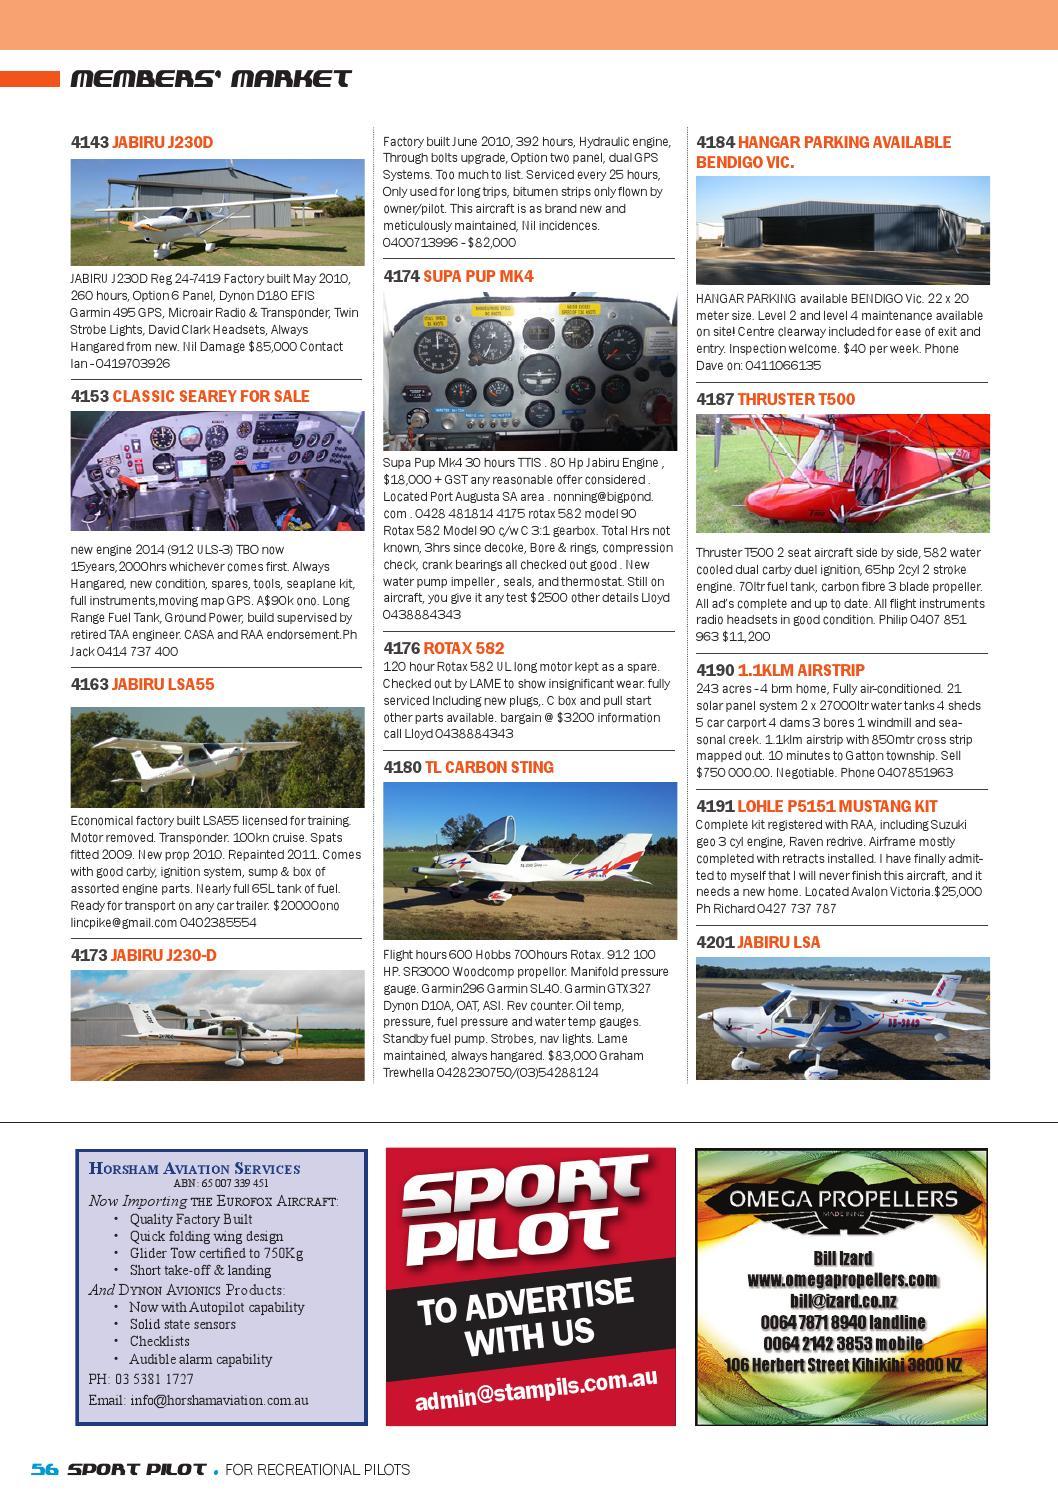 Sport pilot 42 feb 2015 by Recreational Aviation Australia